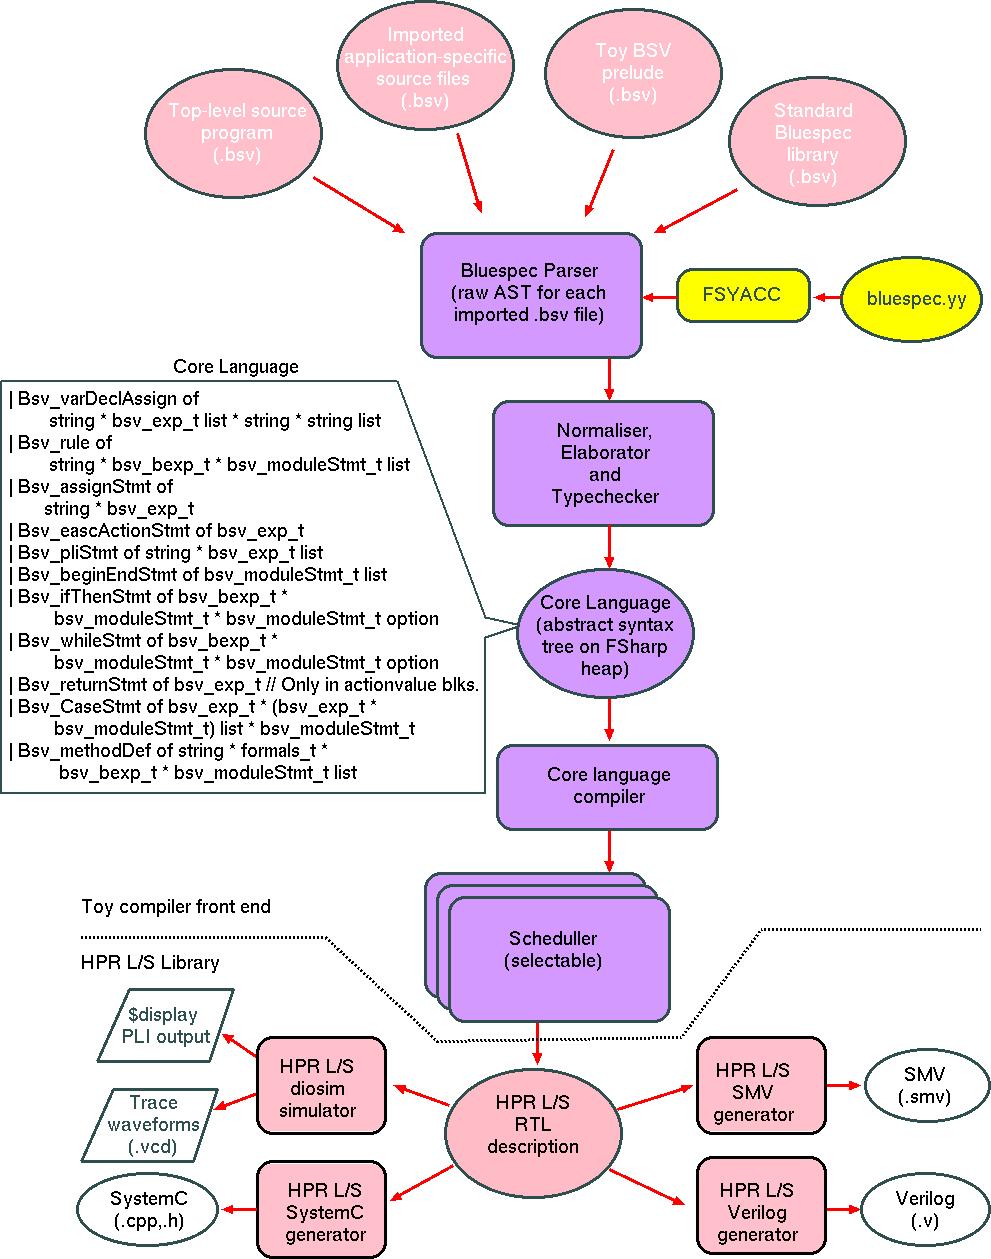 CBG-BSV Orangepath: Toy Bluespec Compiler